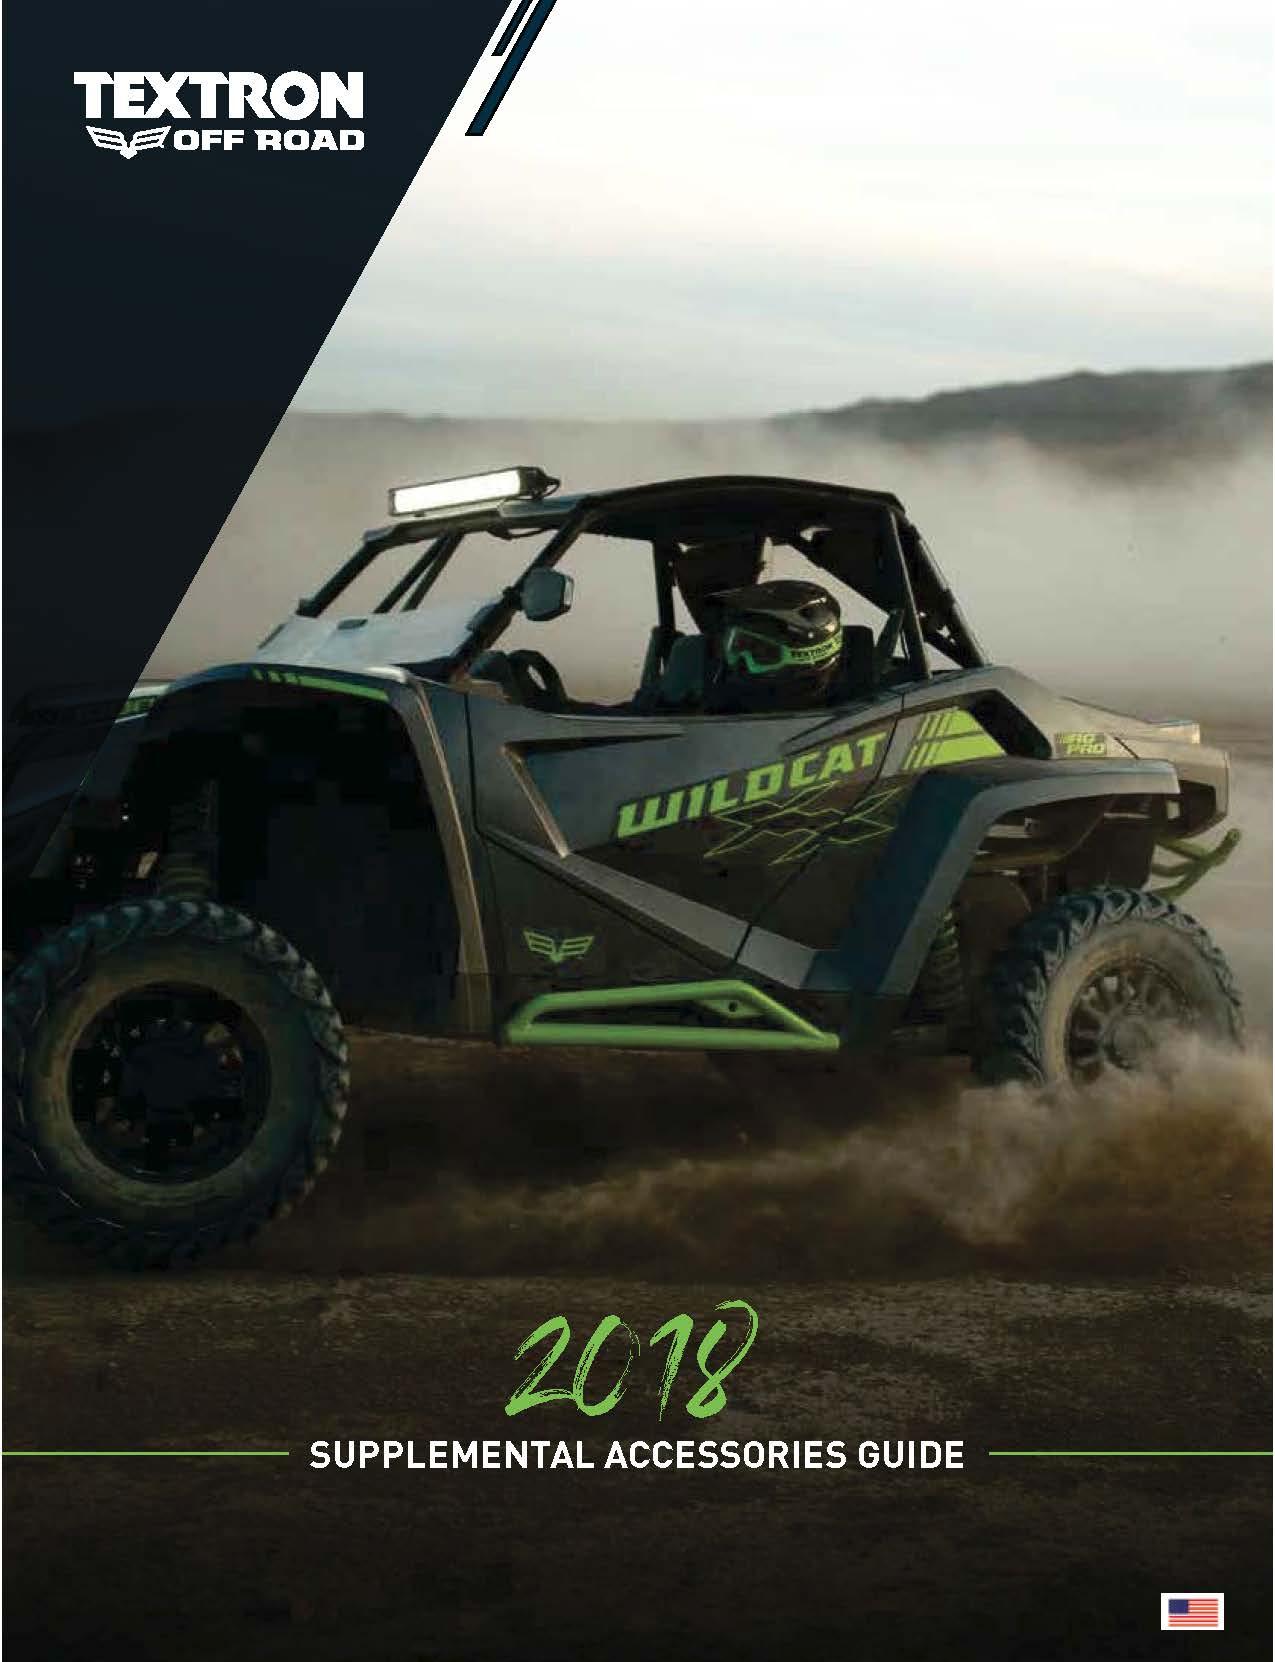 2018 Textron off Road Supplement Catalog